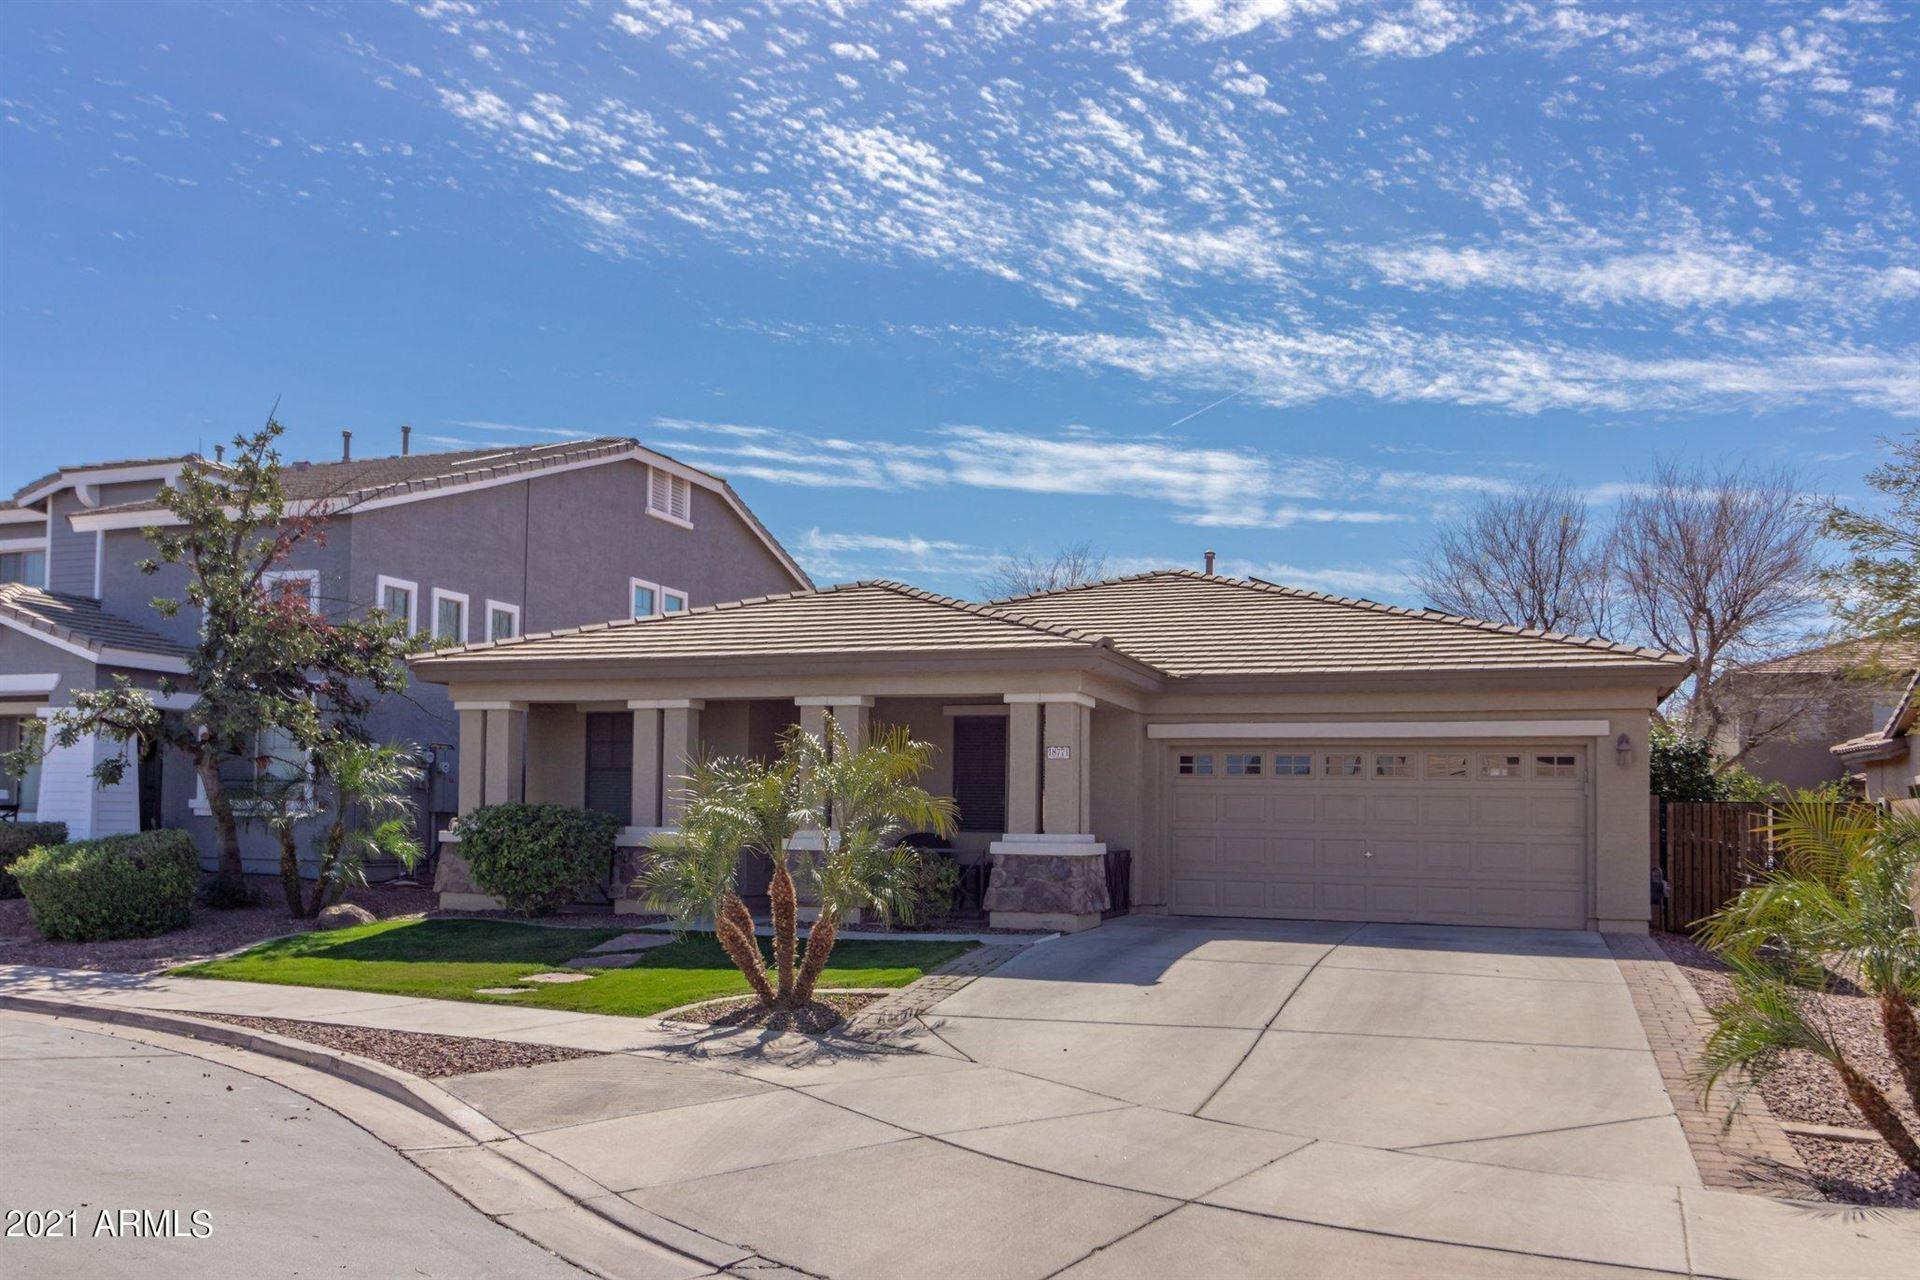 Photo of 18771 E SWAN Drive, Queen Creek, AZ 85142 (MLS # 6202321)